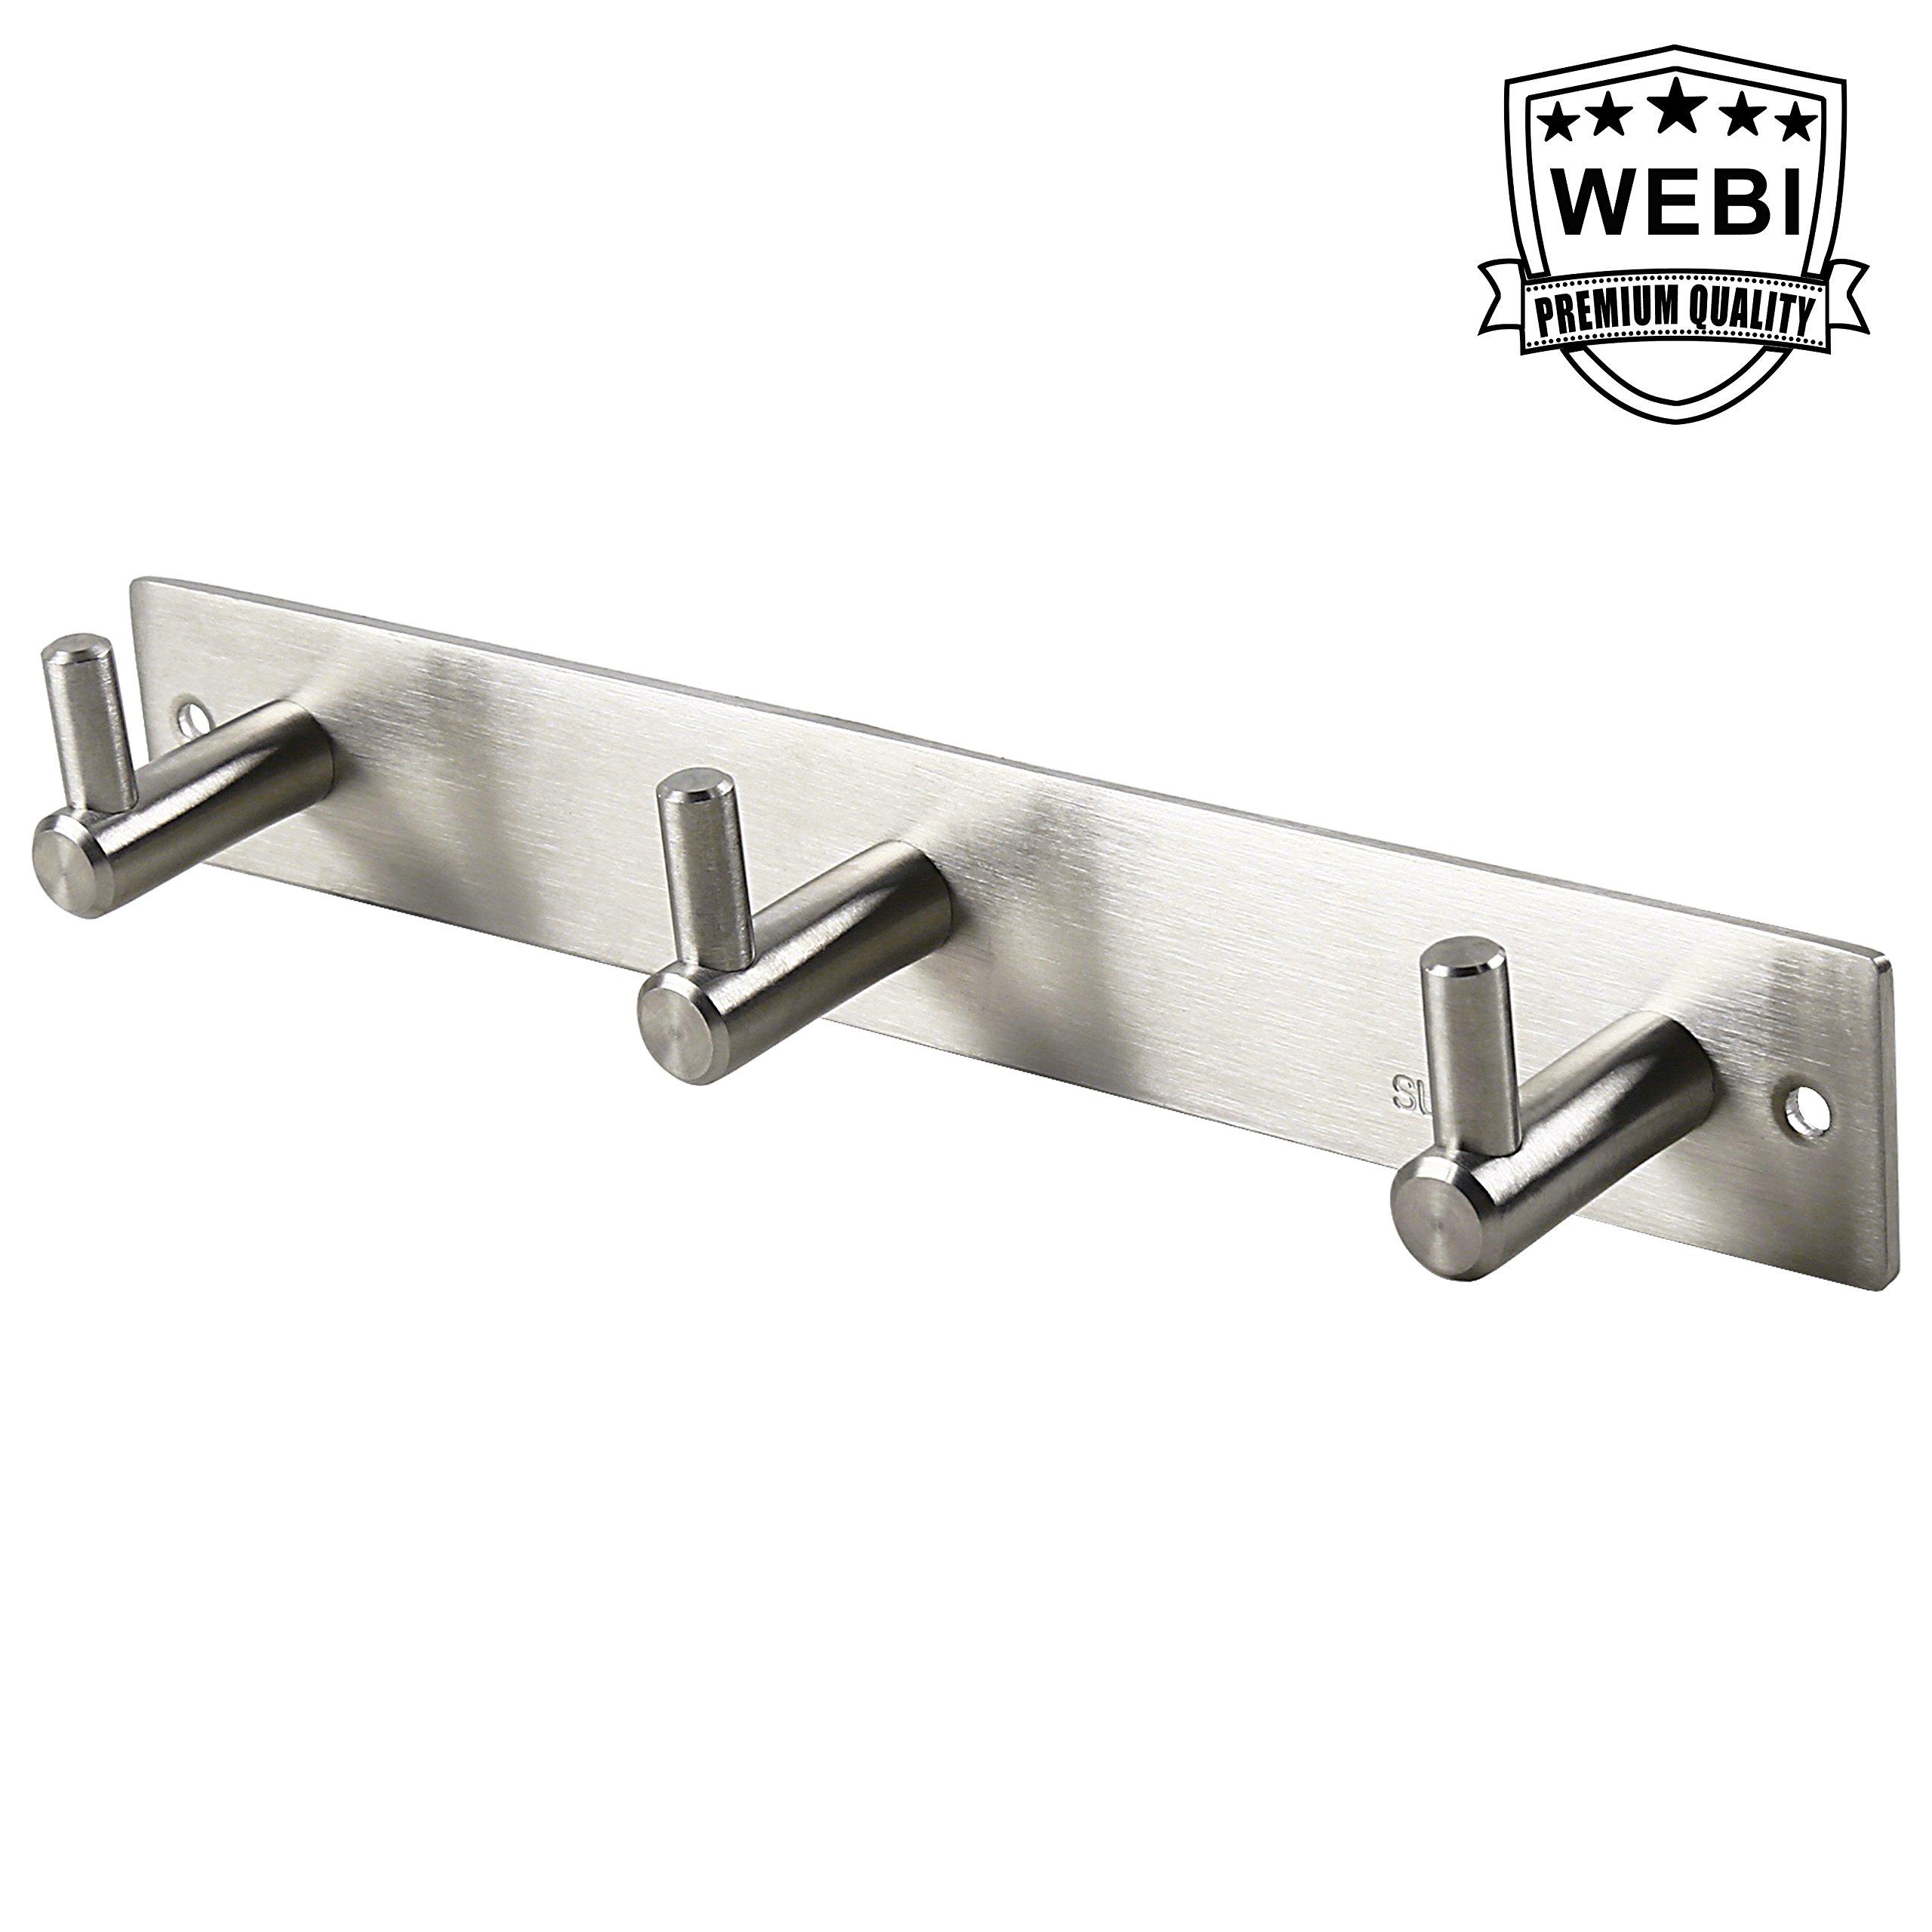 WEBI Heavy Duty SUS 304 Coat Bath Towel Hook Hanger Rail Bar with 3 Hooks, Brushed Finish, for Bedroom, Bathroom, Foyers, Hallways, Entryway, Great Home, Office Storage & Organization, L-YZ03-1